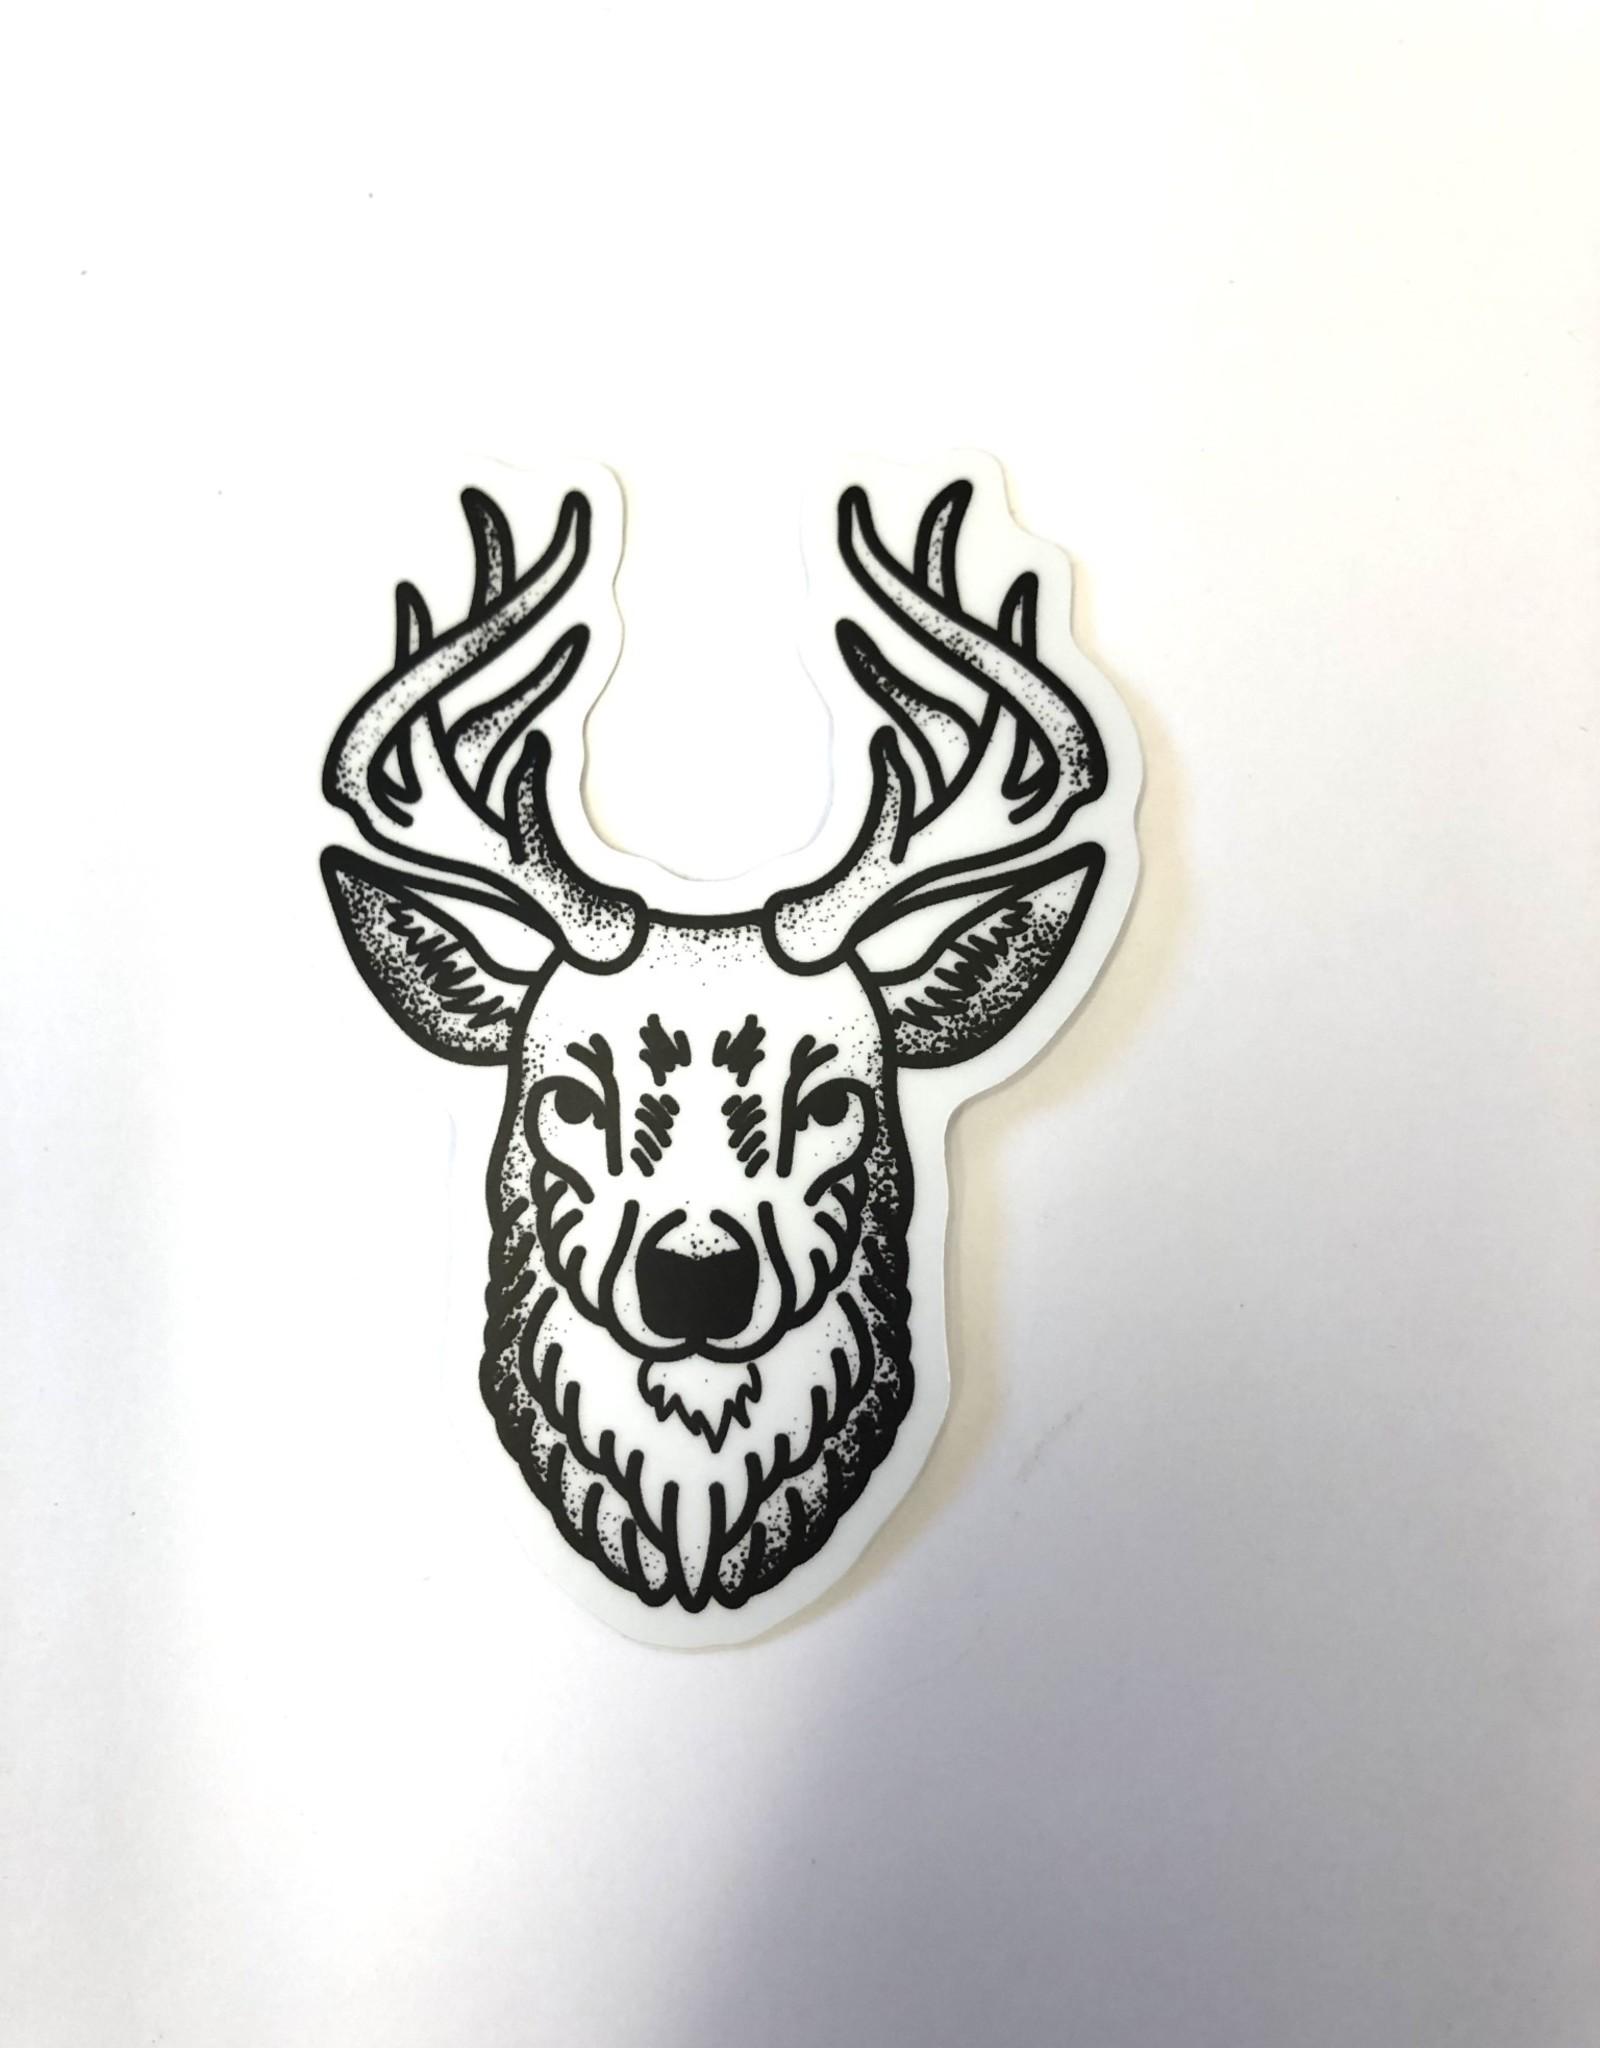 Stickers NW BUCK HEAD STICKER